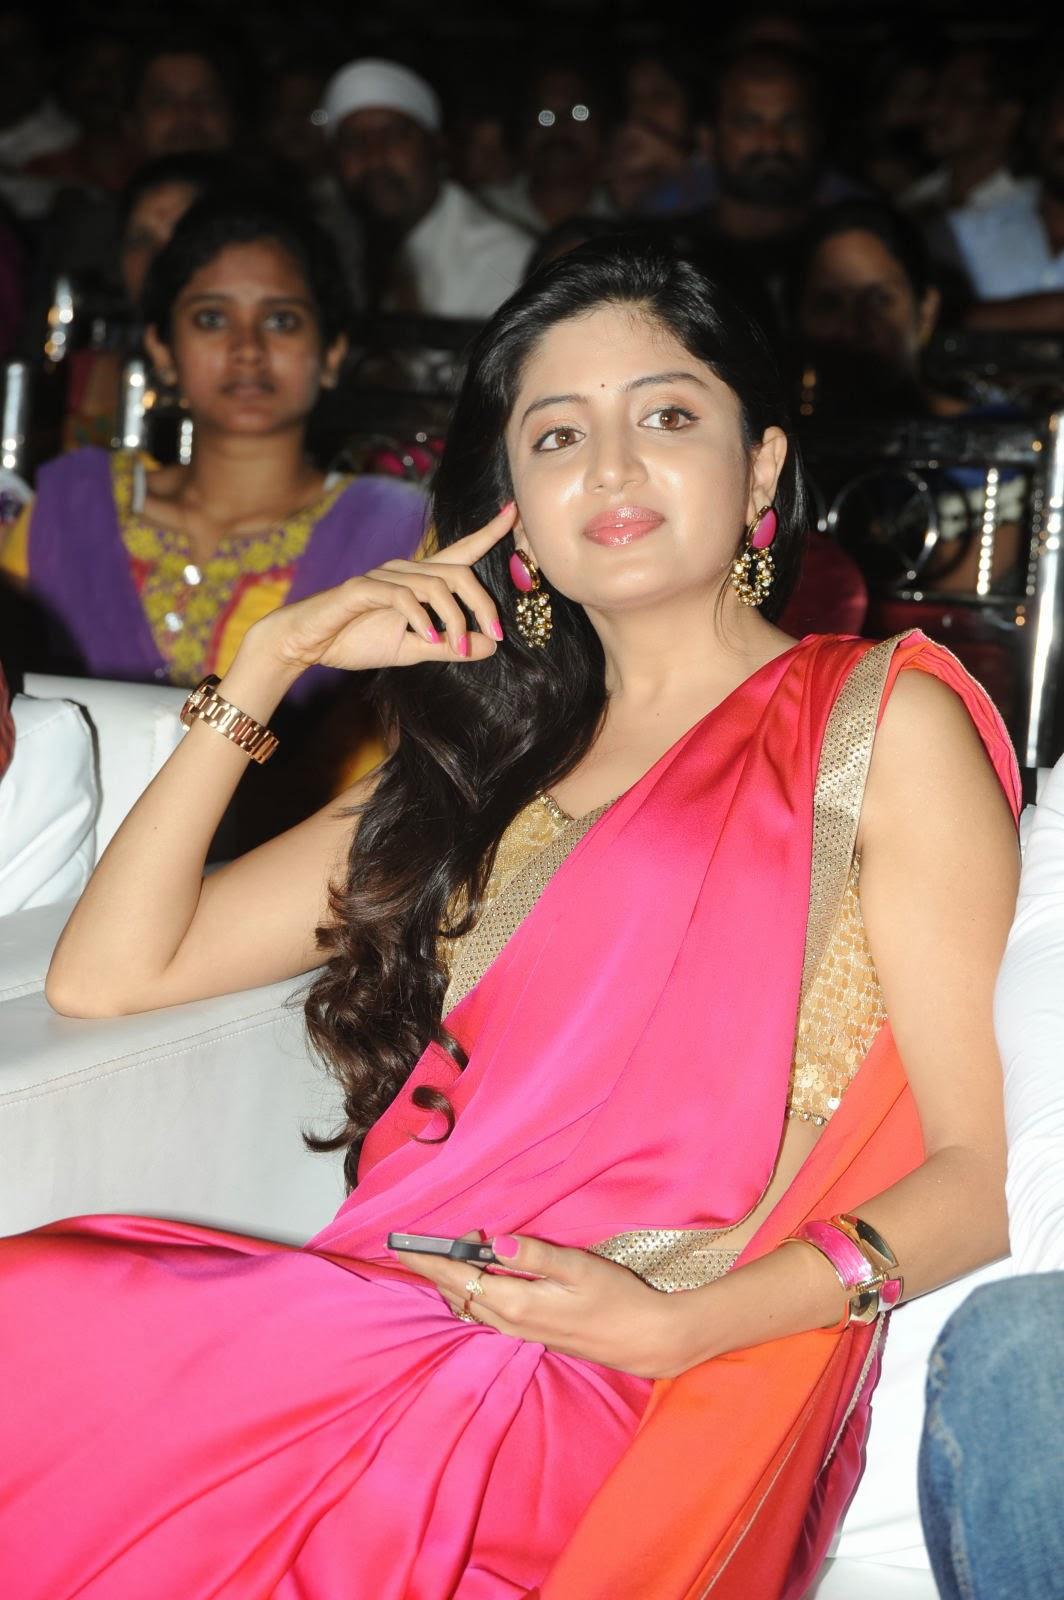 Pretty Poonam Kaur in Pink Saree looking Gorgeous